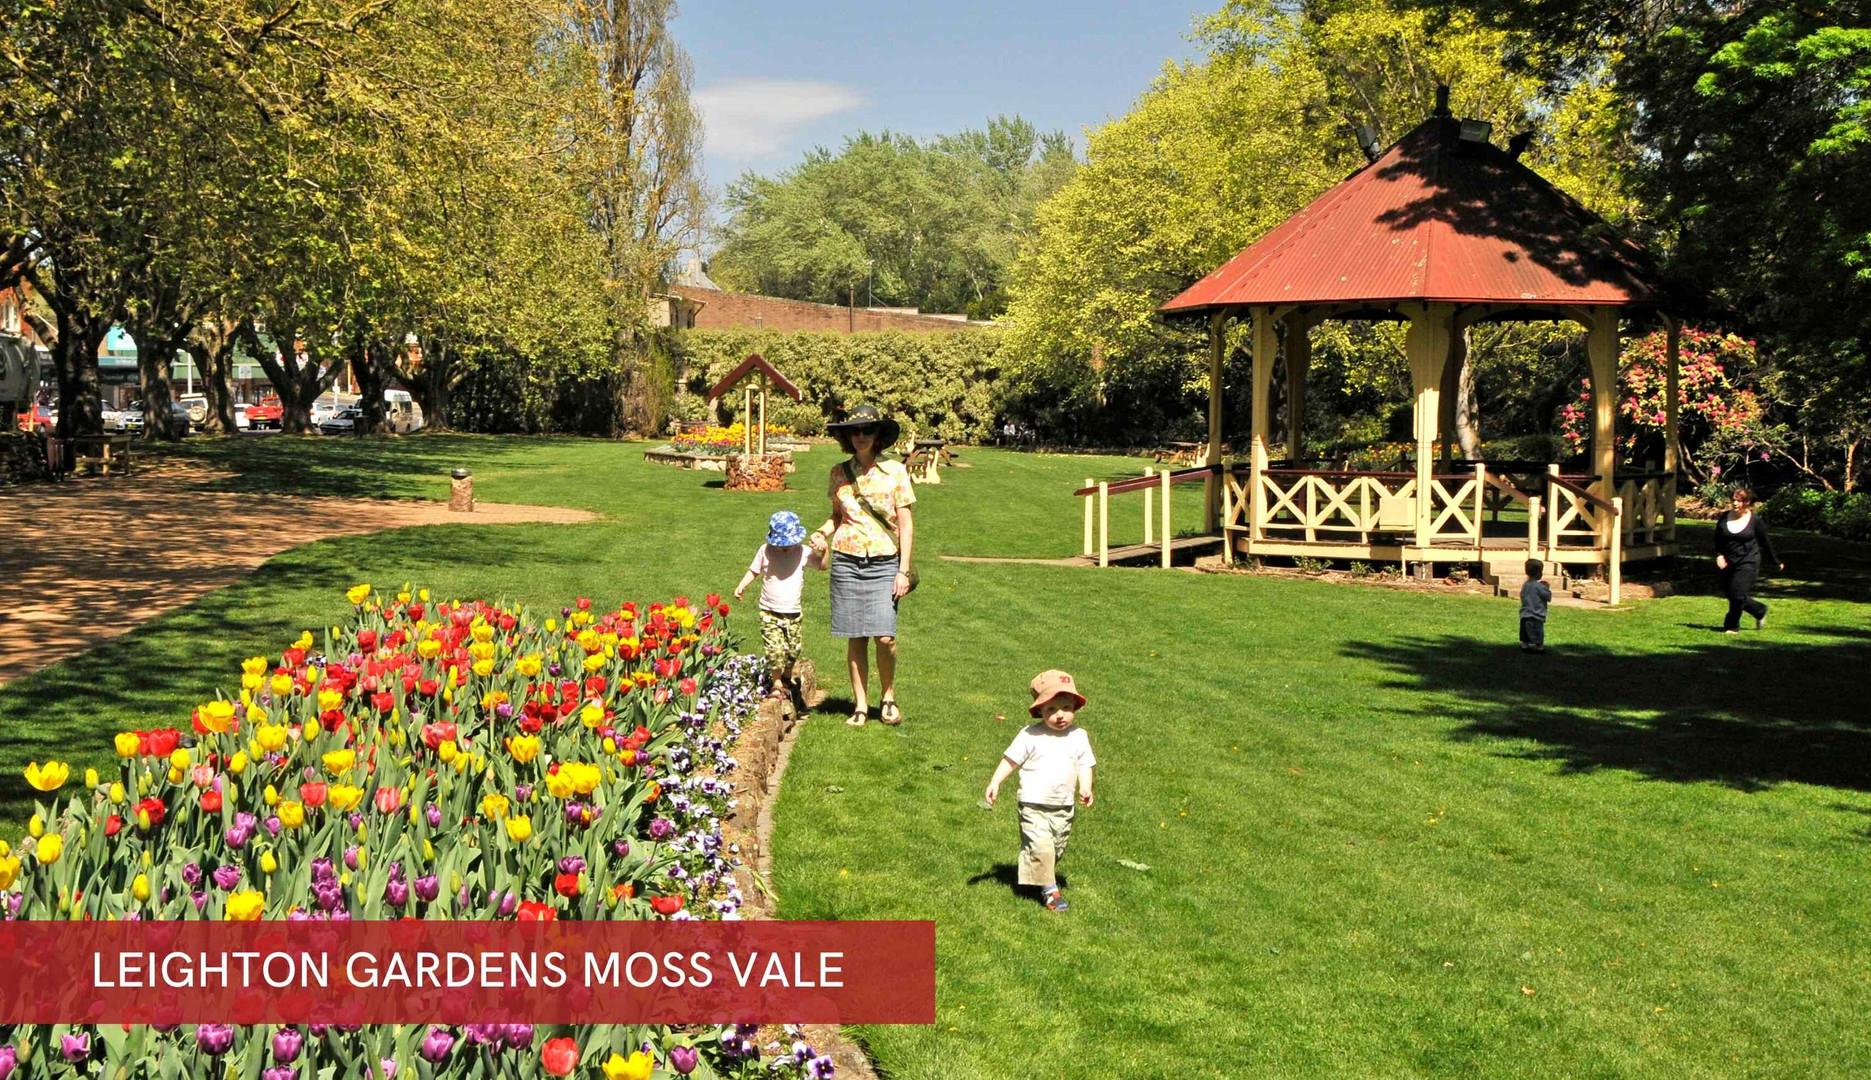 Leighton Gardens Moss Vale .jpg